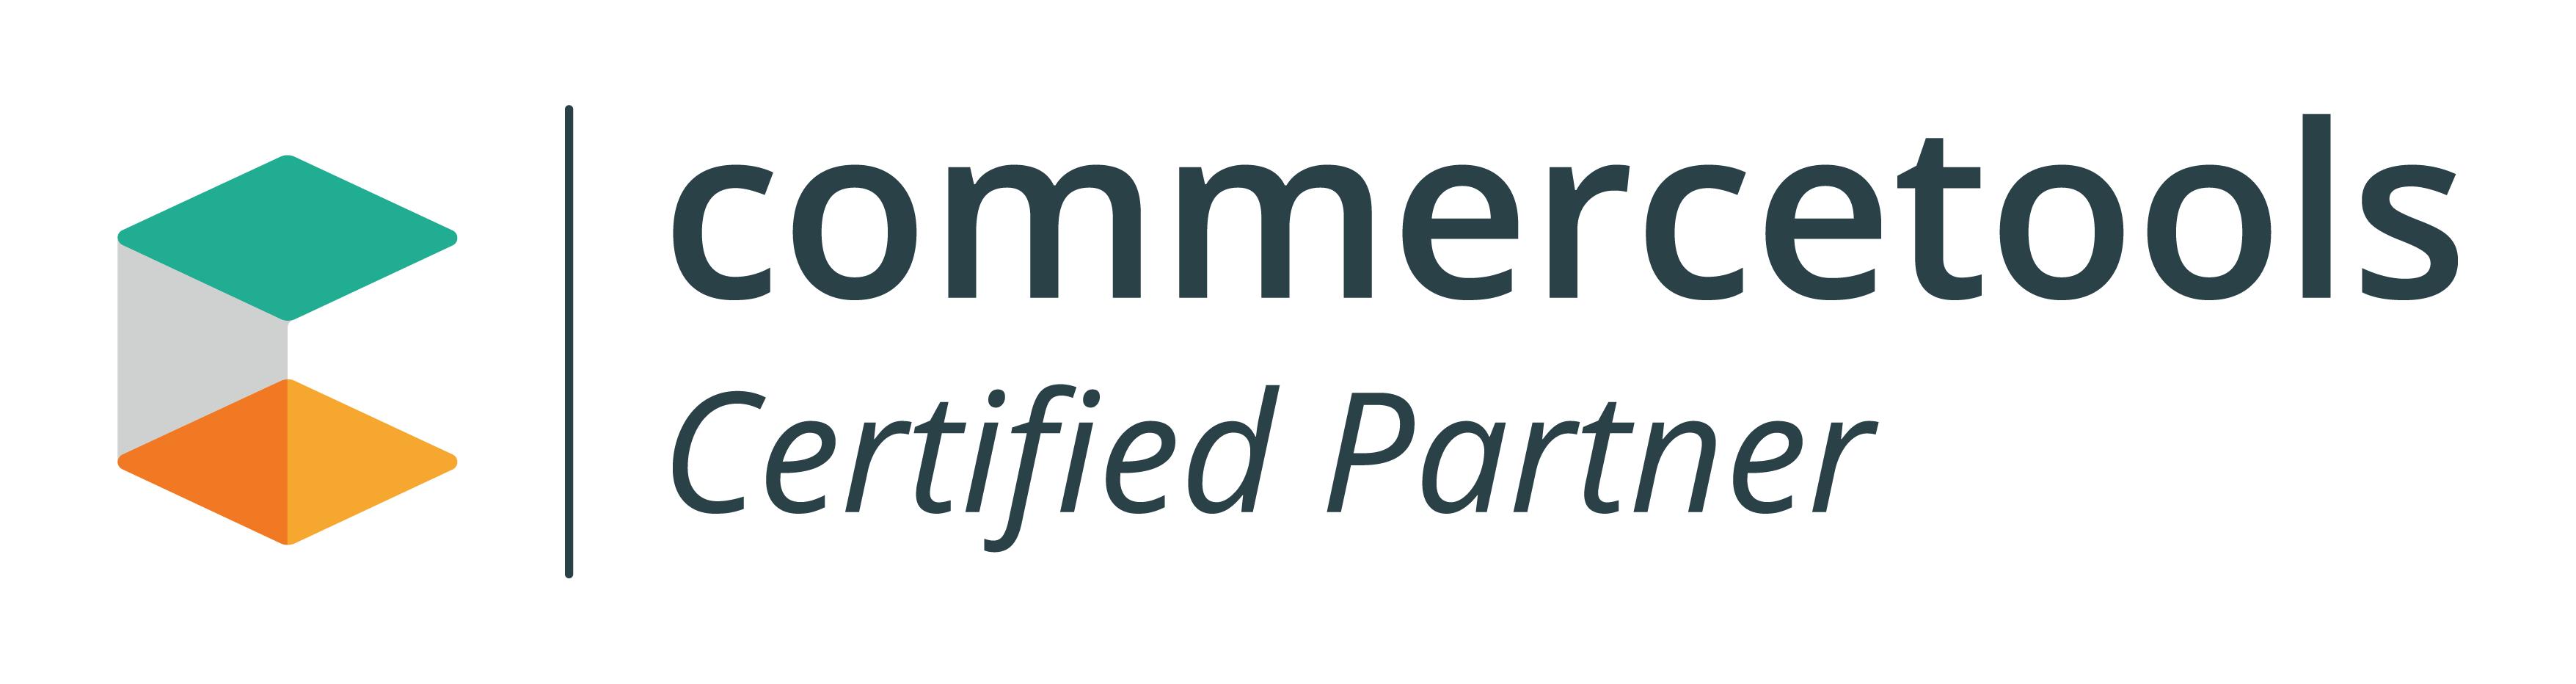 commercetools-certified-partner-quer